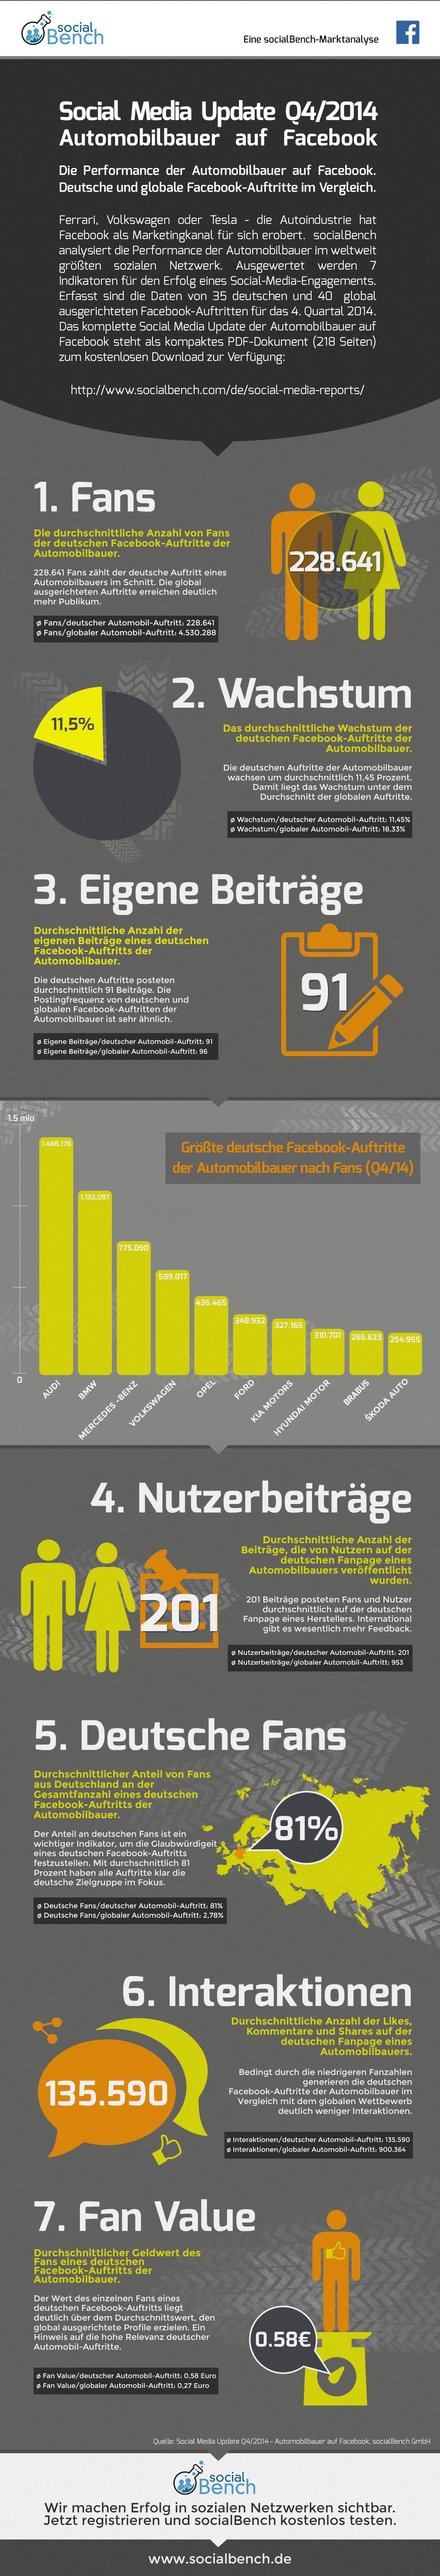 Infografik: Social Media Update Q4/2014 - Automobilbauer auf Facebook http://www.socialbench.com/de/report/automobile/q42014/